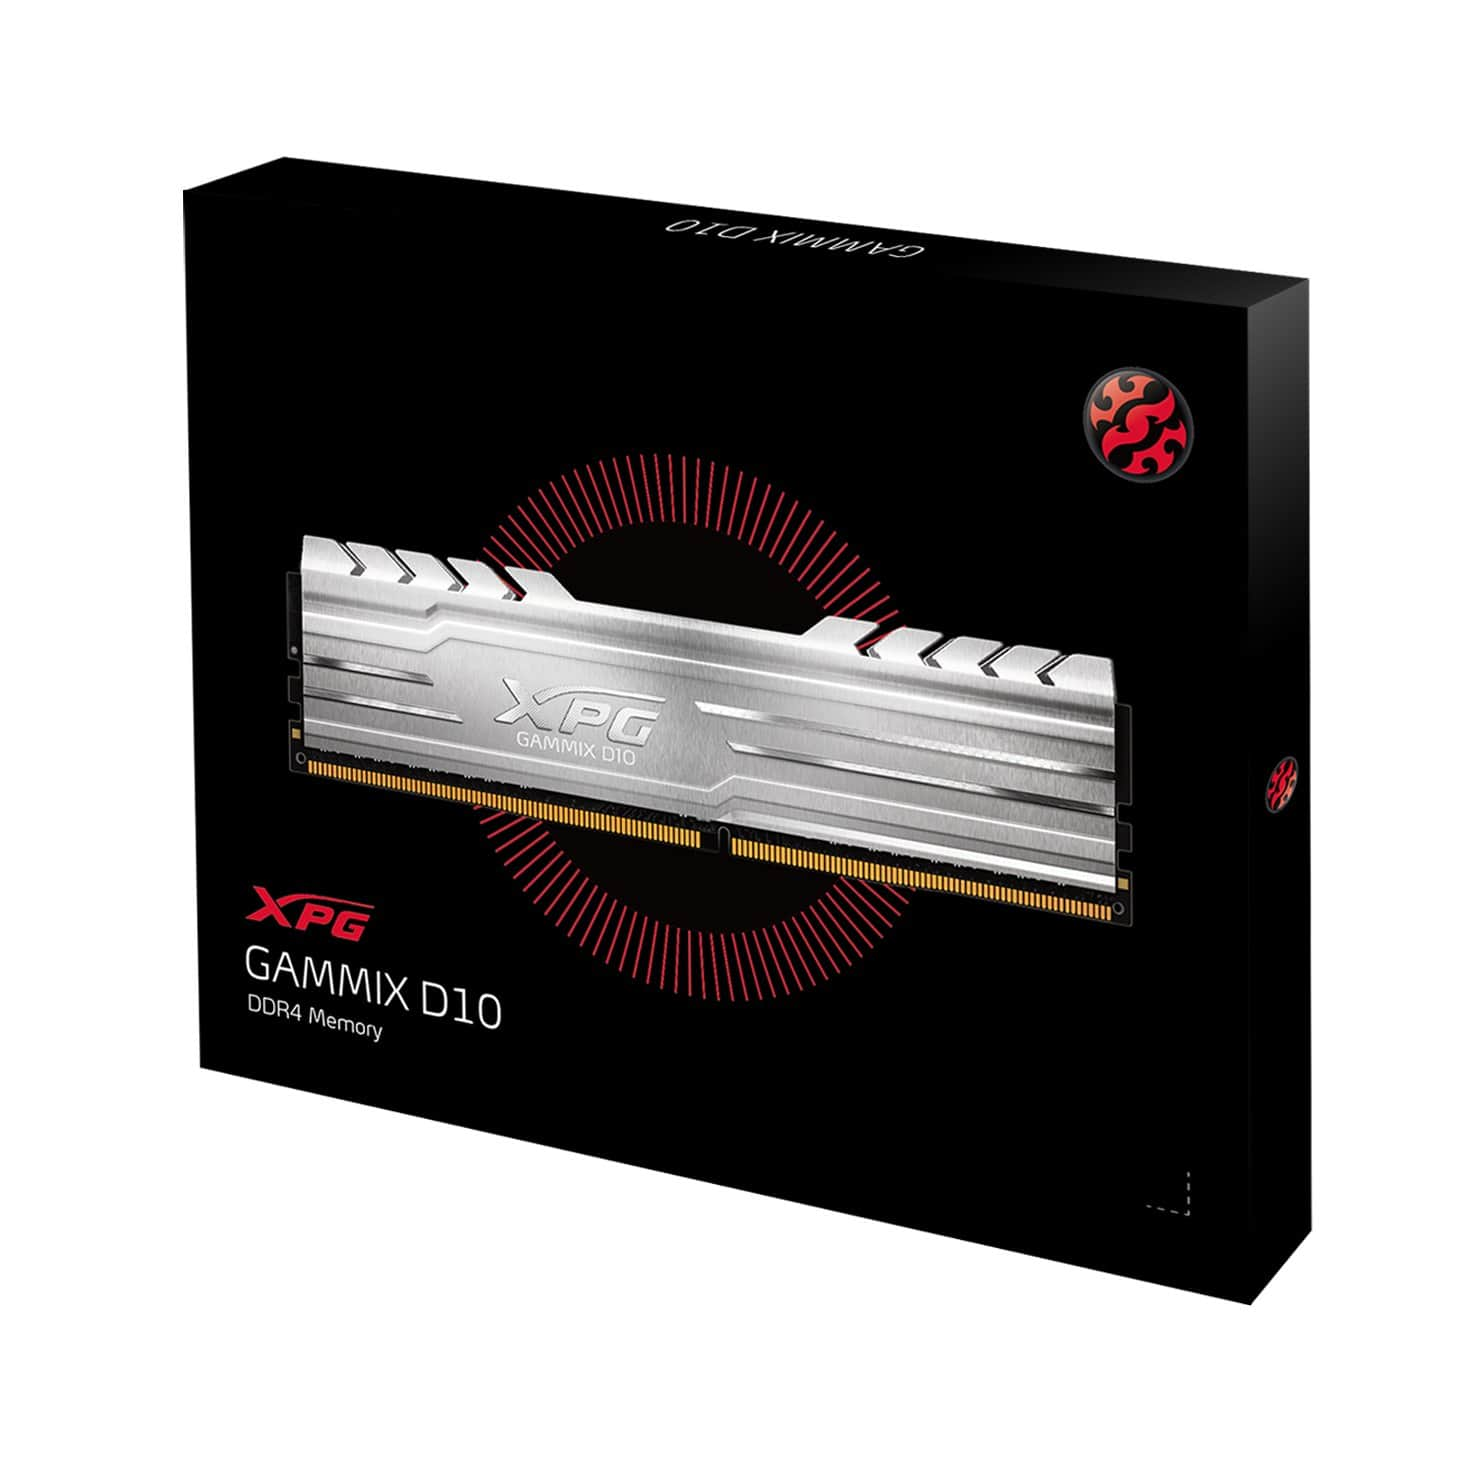 16GB (2x8GB) ADATA XPG GAMMIX D10 DDR4 3000MHz Desktop Memory $53.50 + free shipping